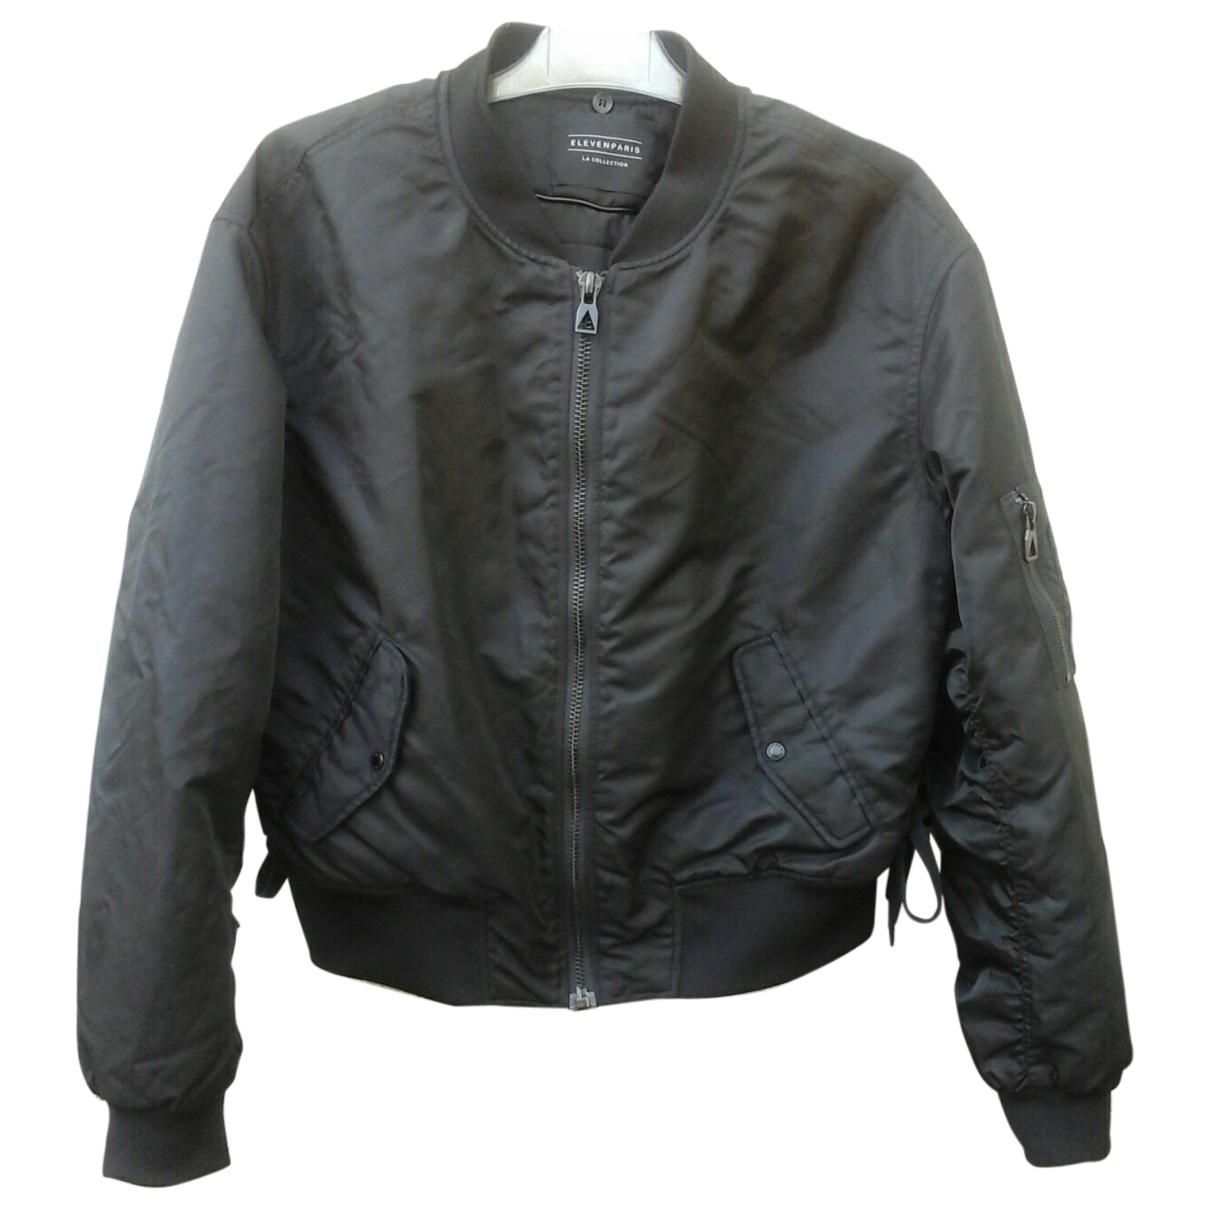 Eleven Paris \N Black Leather jacket for Women L International